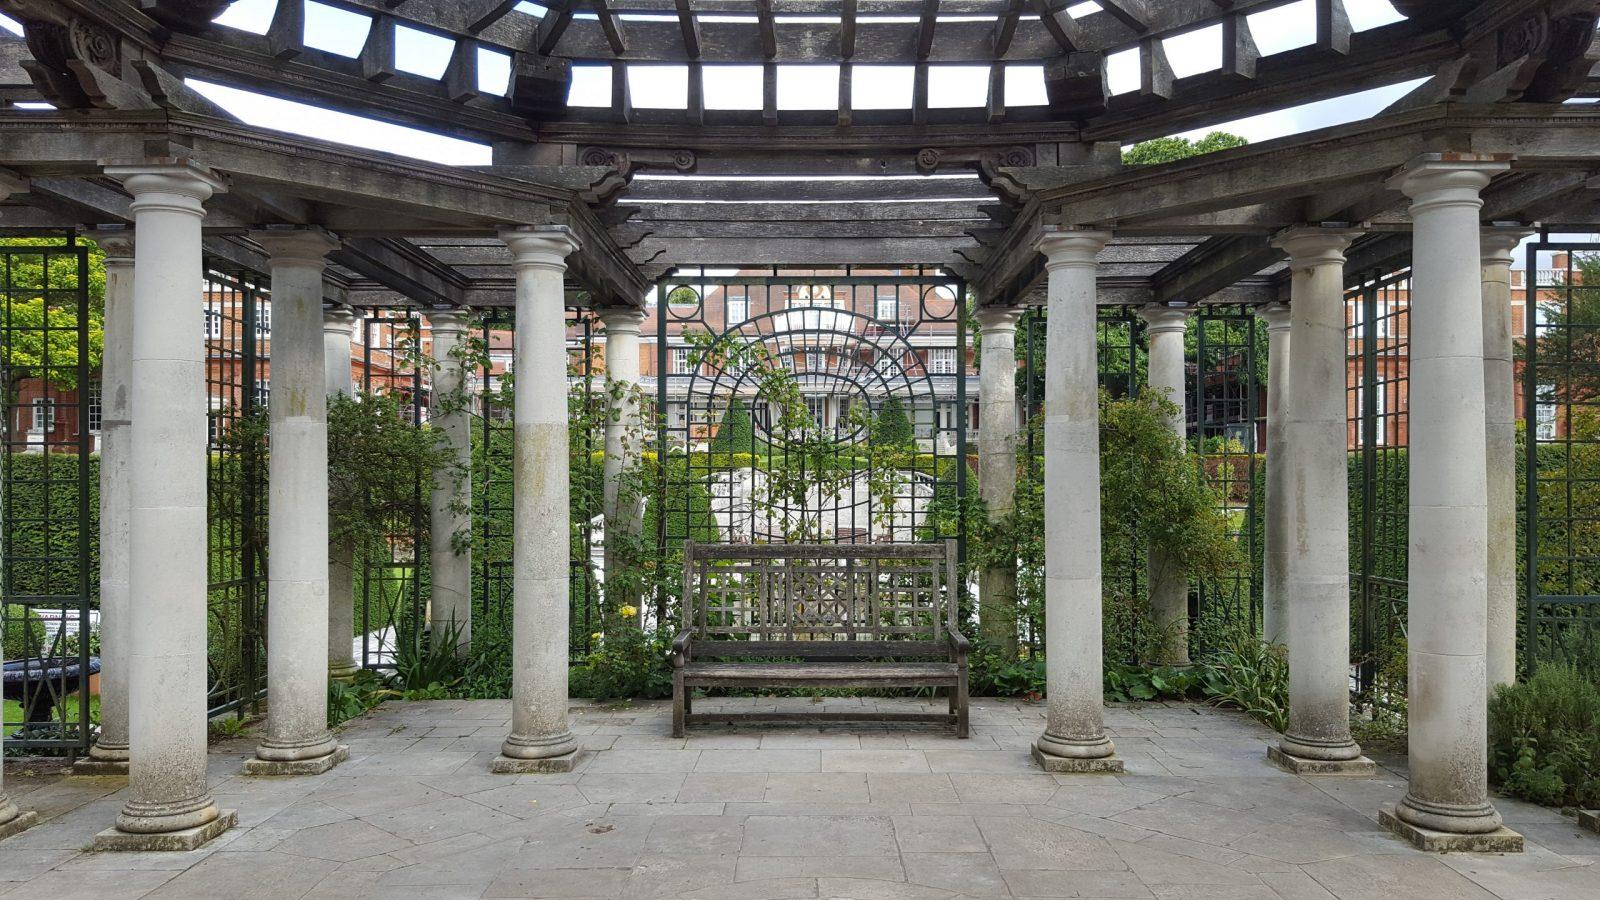 Visiting Hill Garden & Pergola, Hampstead Heath: Photo Gallery 9